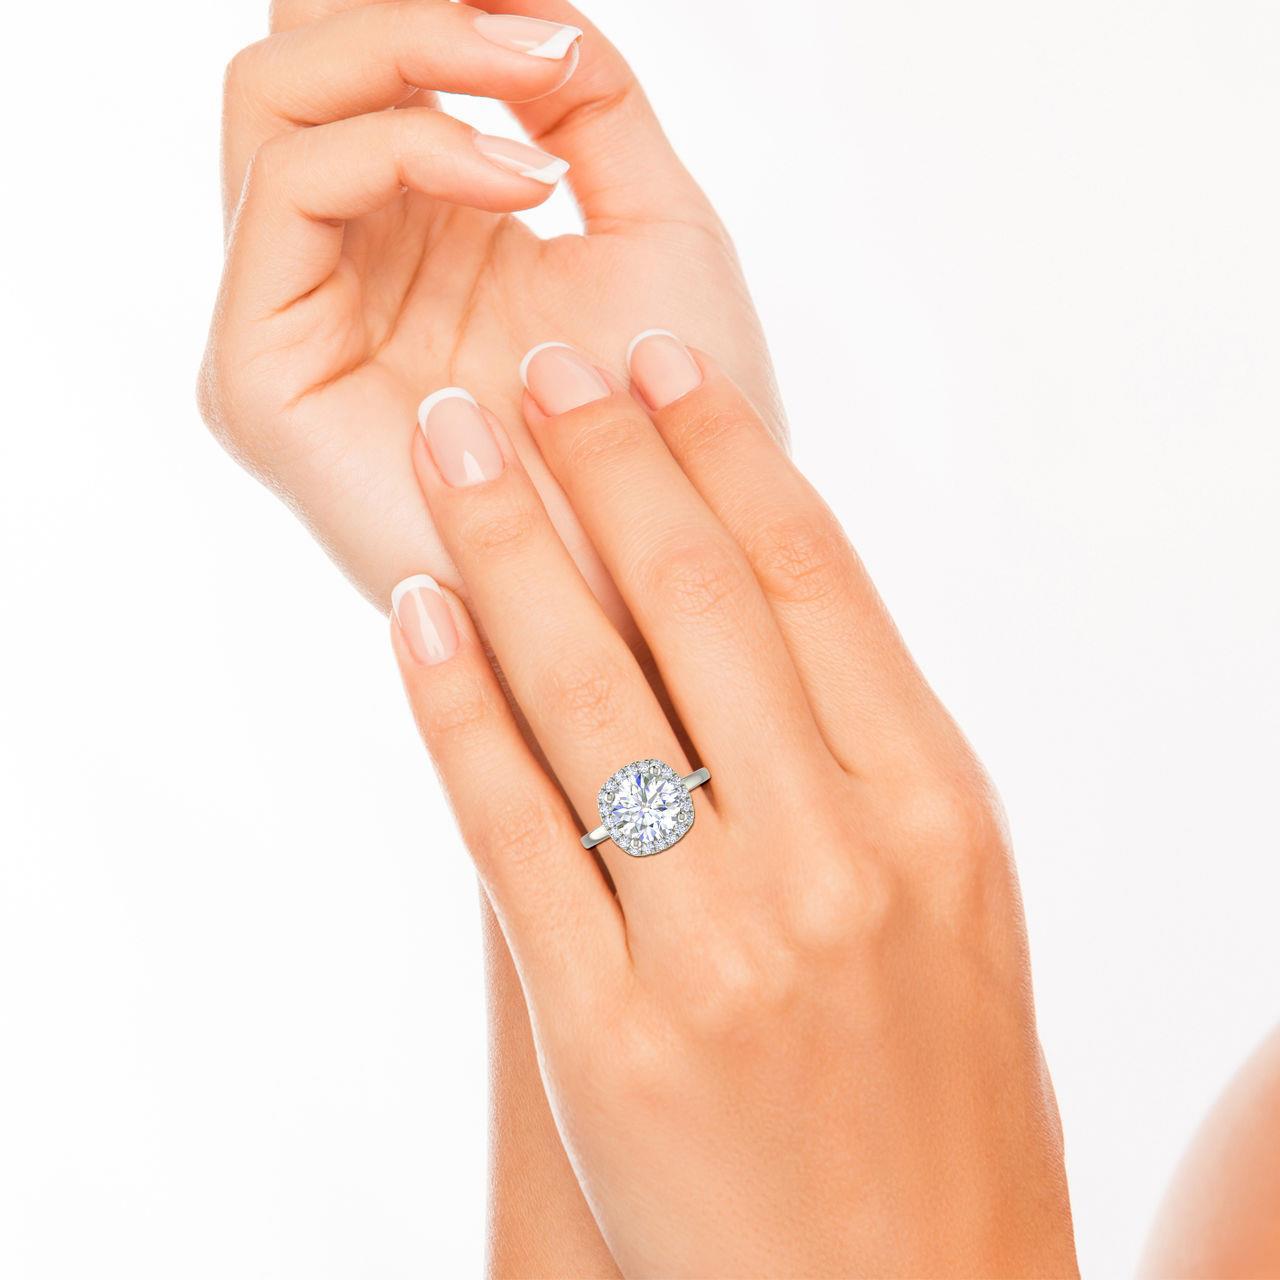 Halo 1.25 Carat Round Cut Diamond Engagement Ring